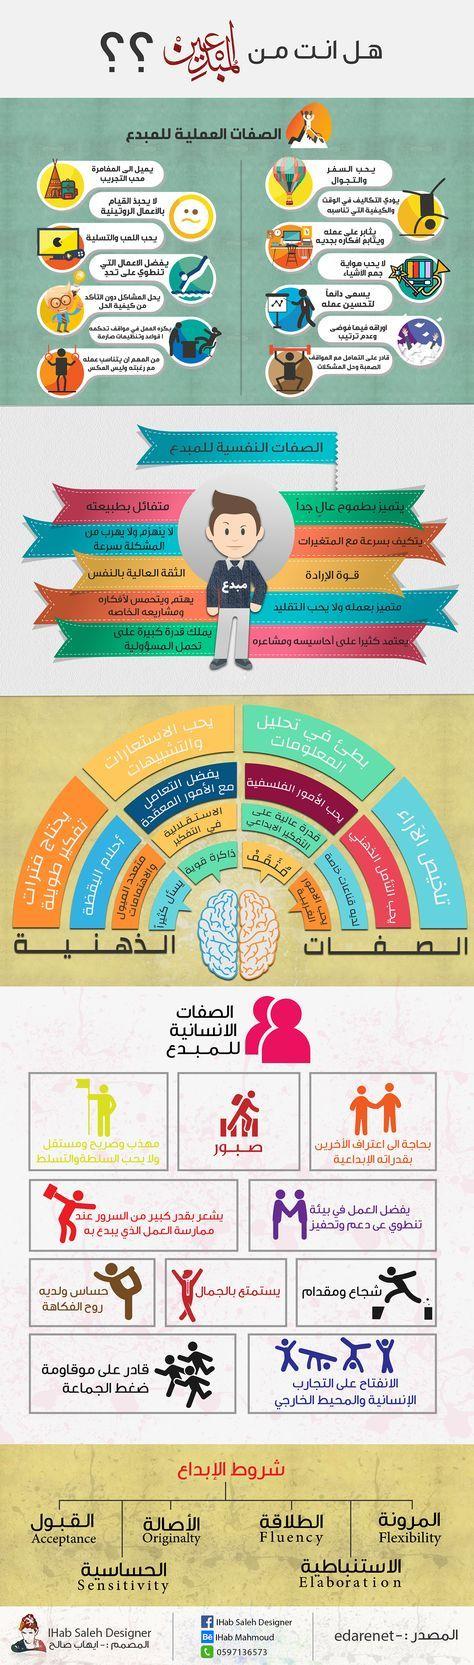 Infographic Are You From The Creators انفوجرافيك هل انت من المبدعين Intellegence Instagram Picture Quotes Photo Video App